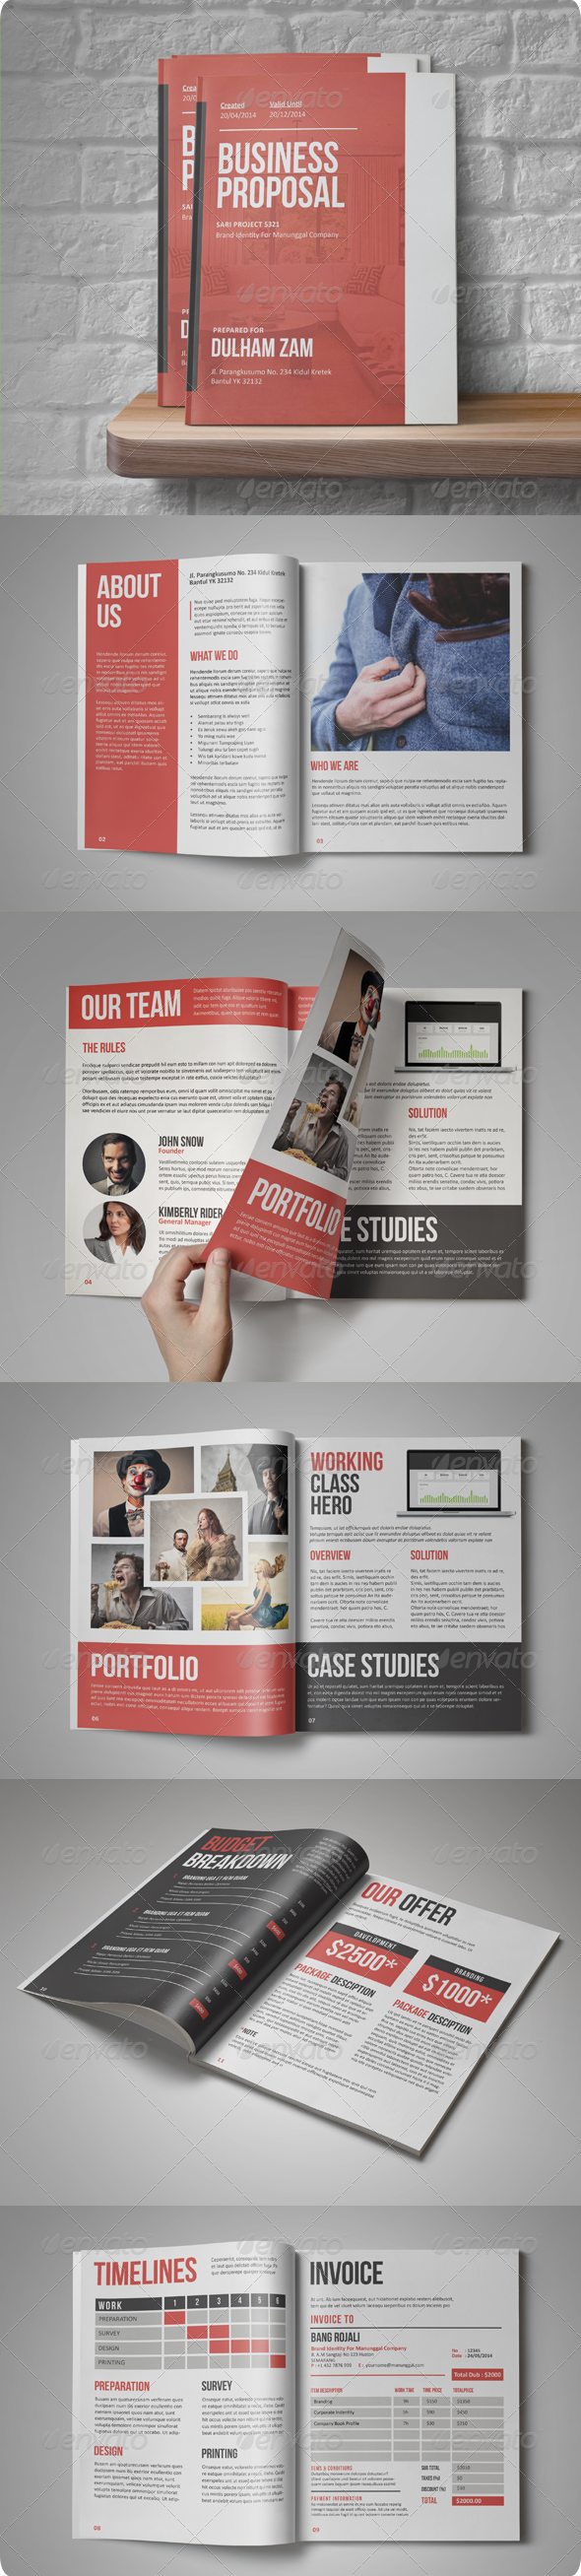 GraphicRiver Sari Business Proposal 8245714